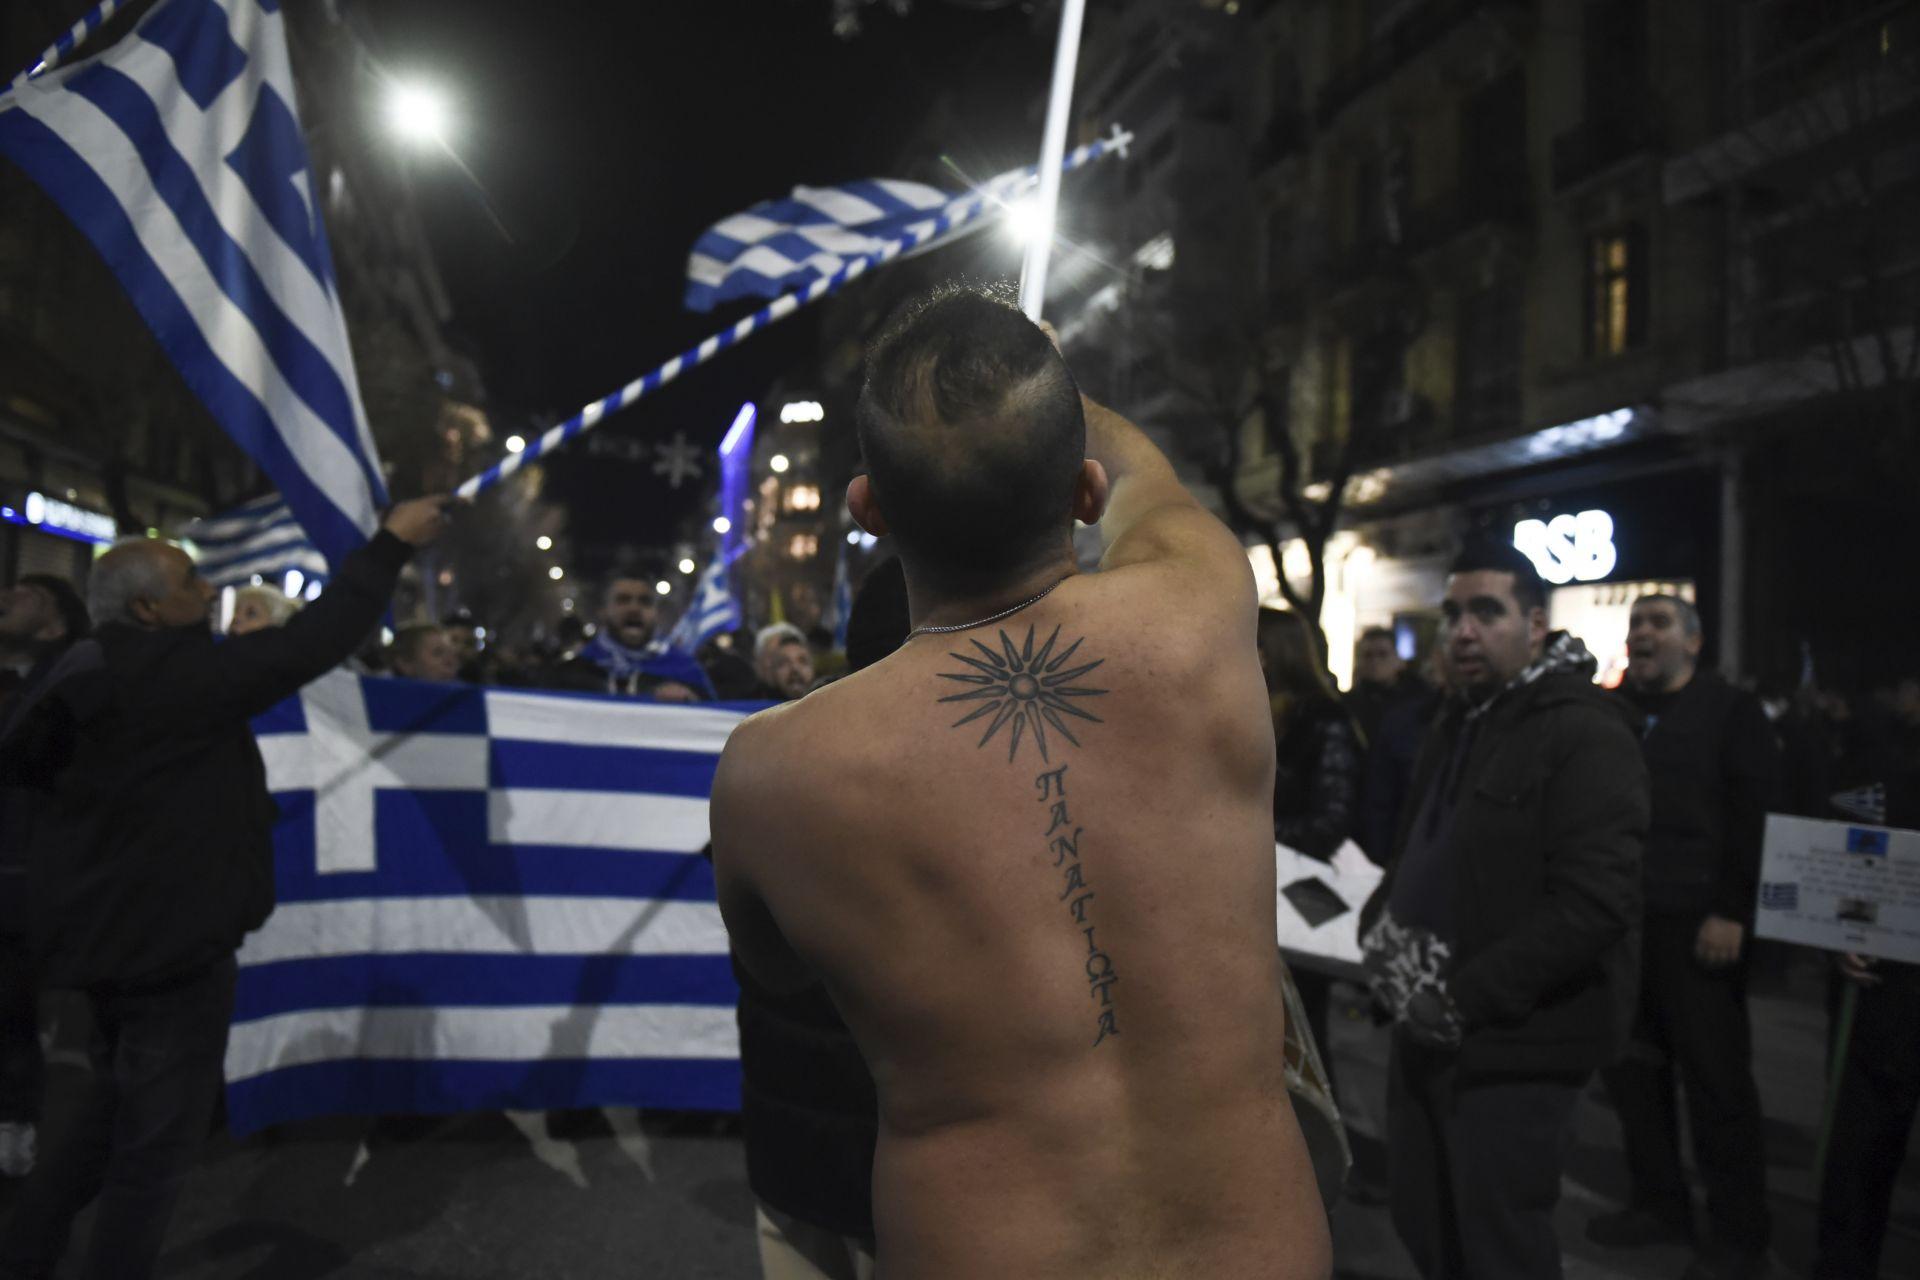 Противници на Преспанското споразумение протестират в Солун